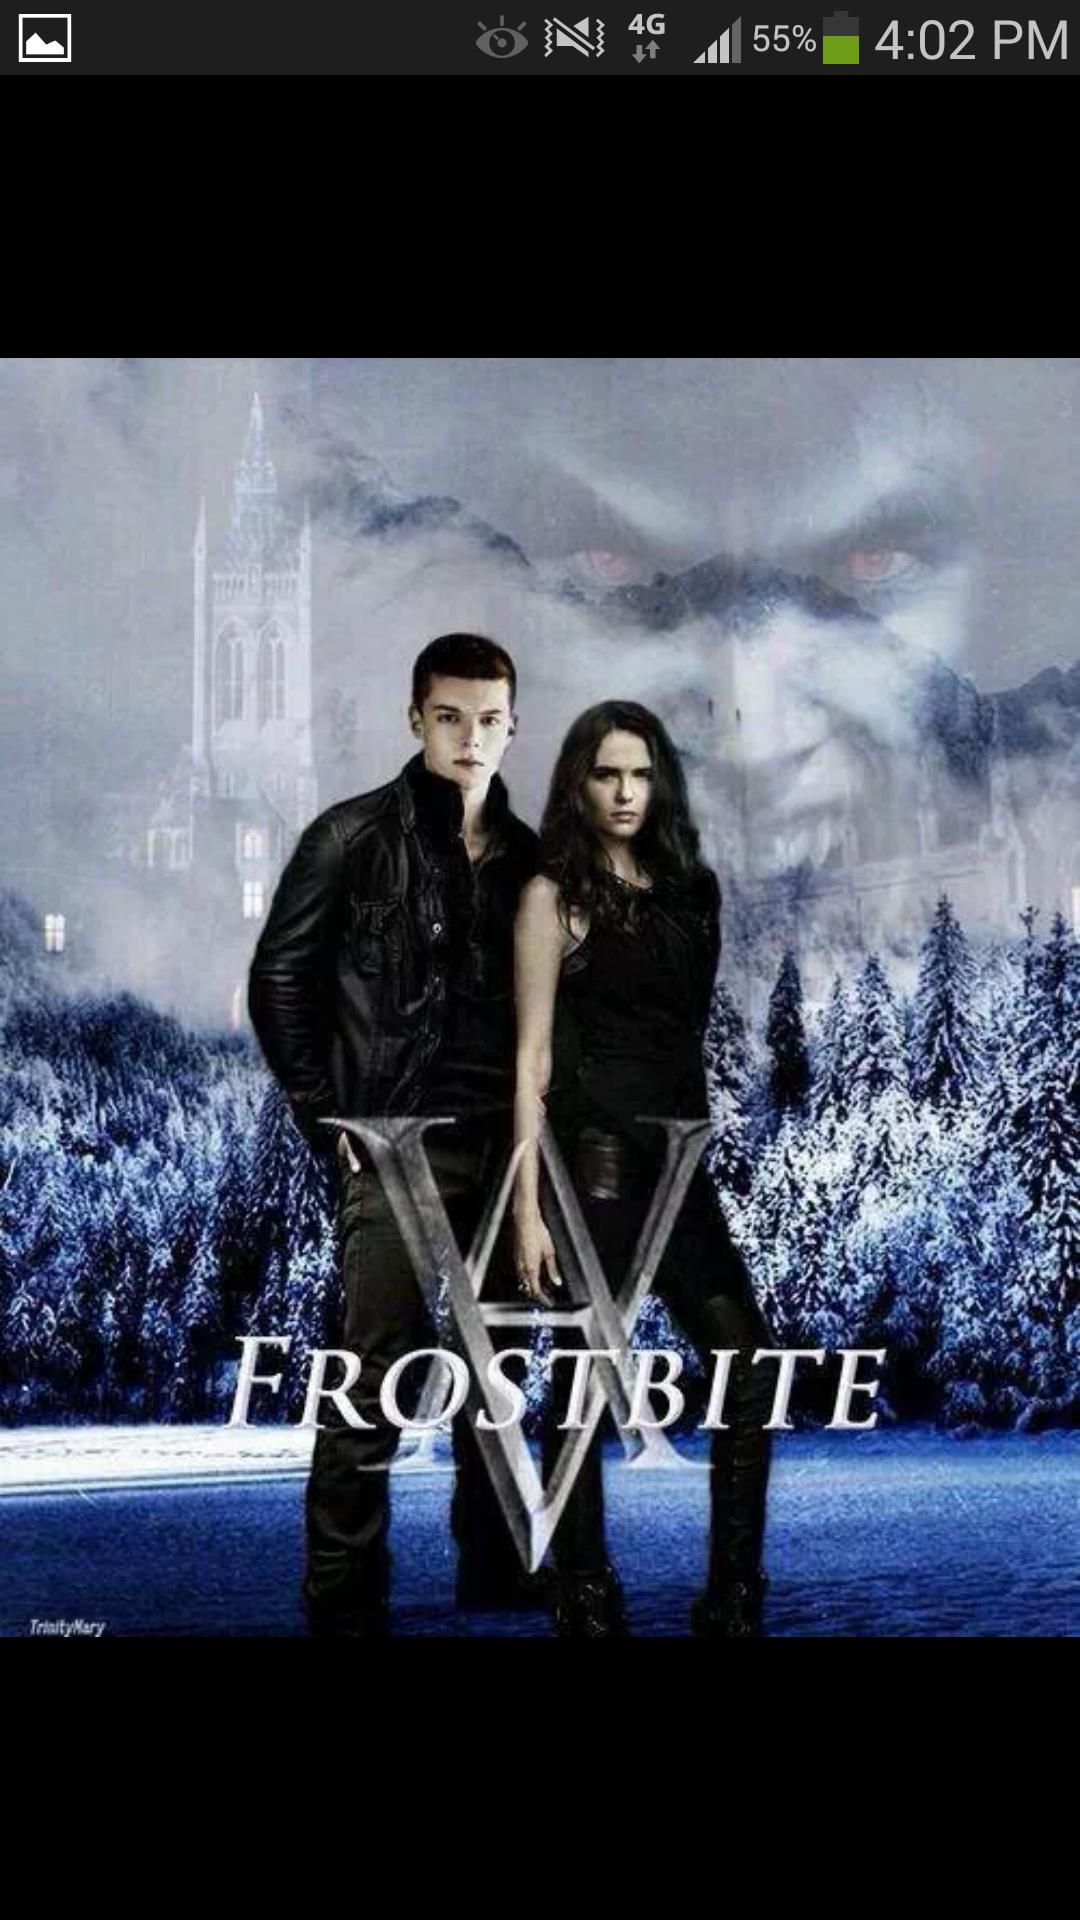 # Frostbite 2015